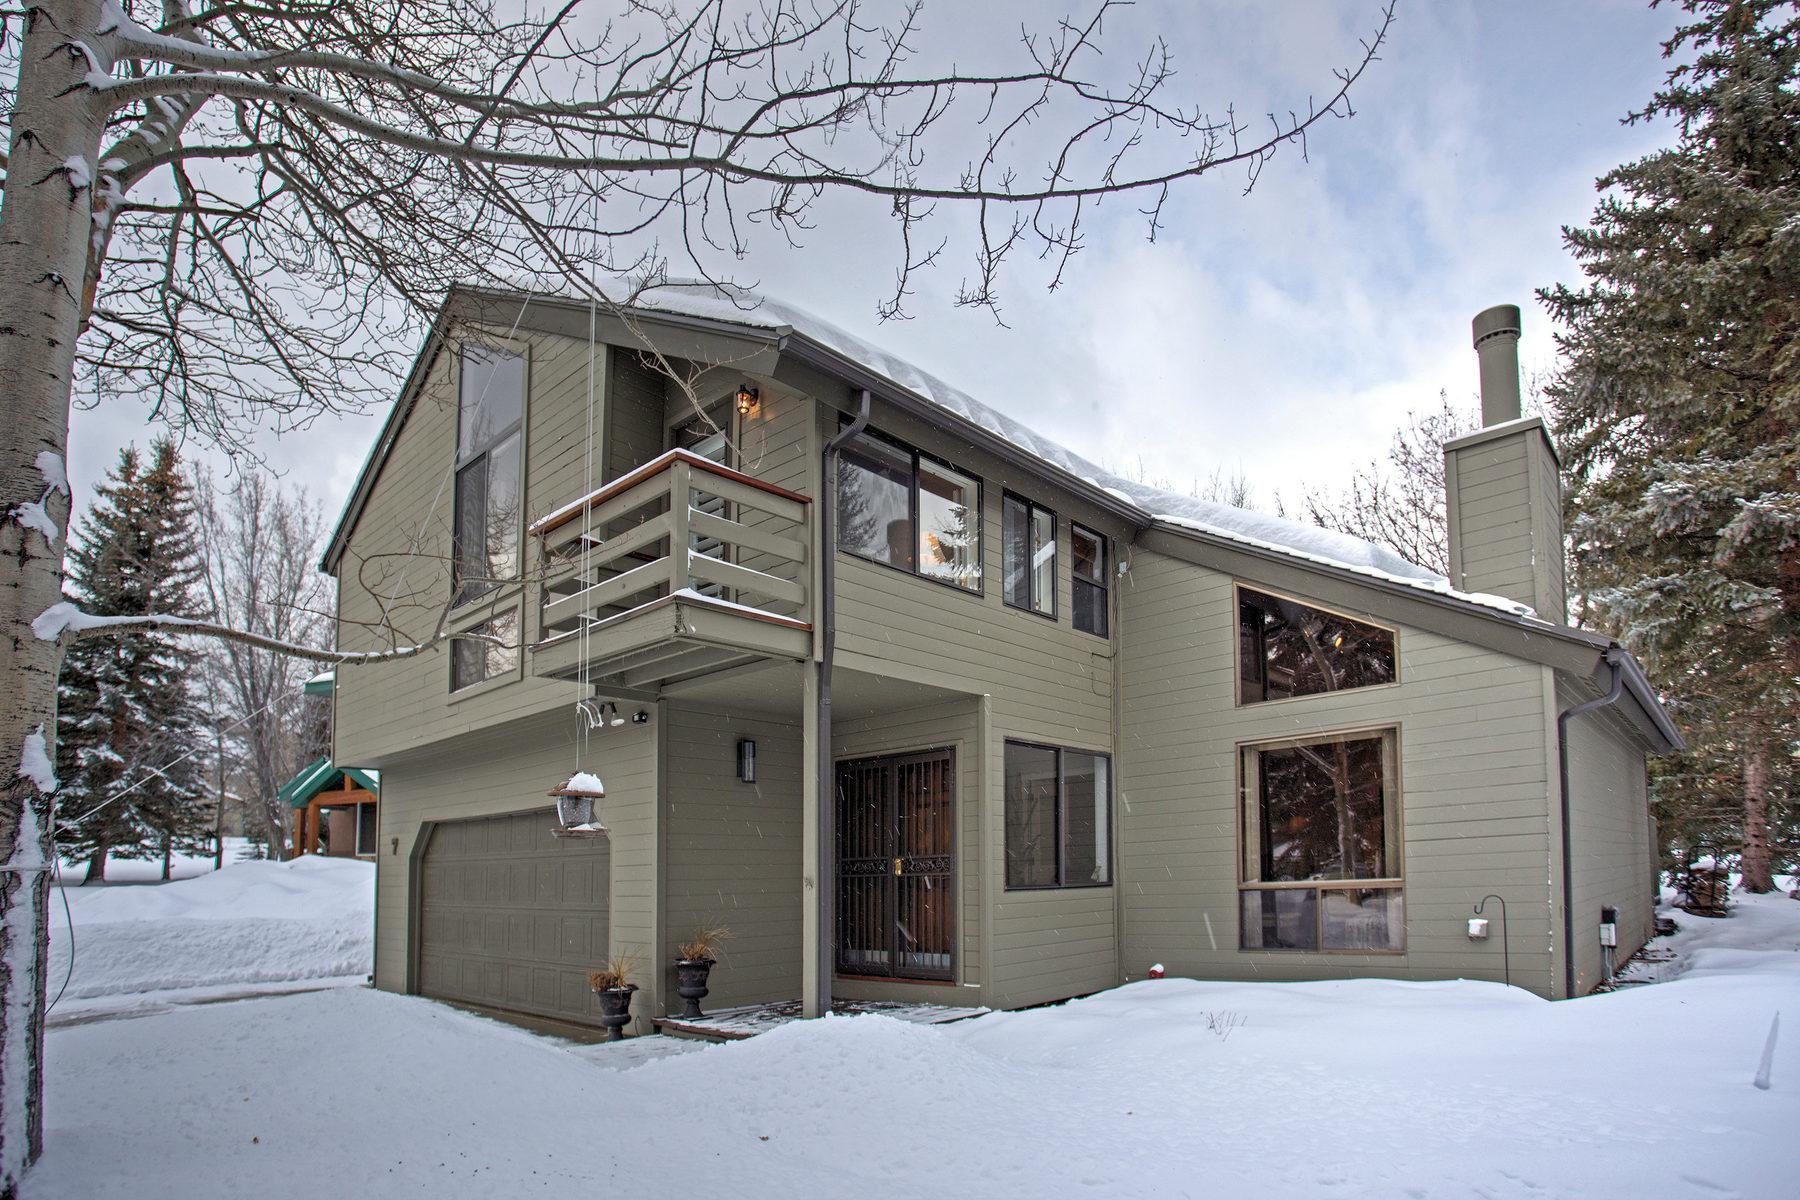 Casa para uma família para Venda às Perfect location in Thaynes Canyon on a Cul De Sac & Eighth Green of Park City M 7 Double Jack Ct Park City, Utah, 84060 Estados Unidos